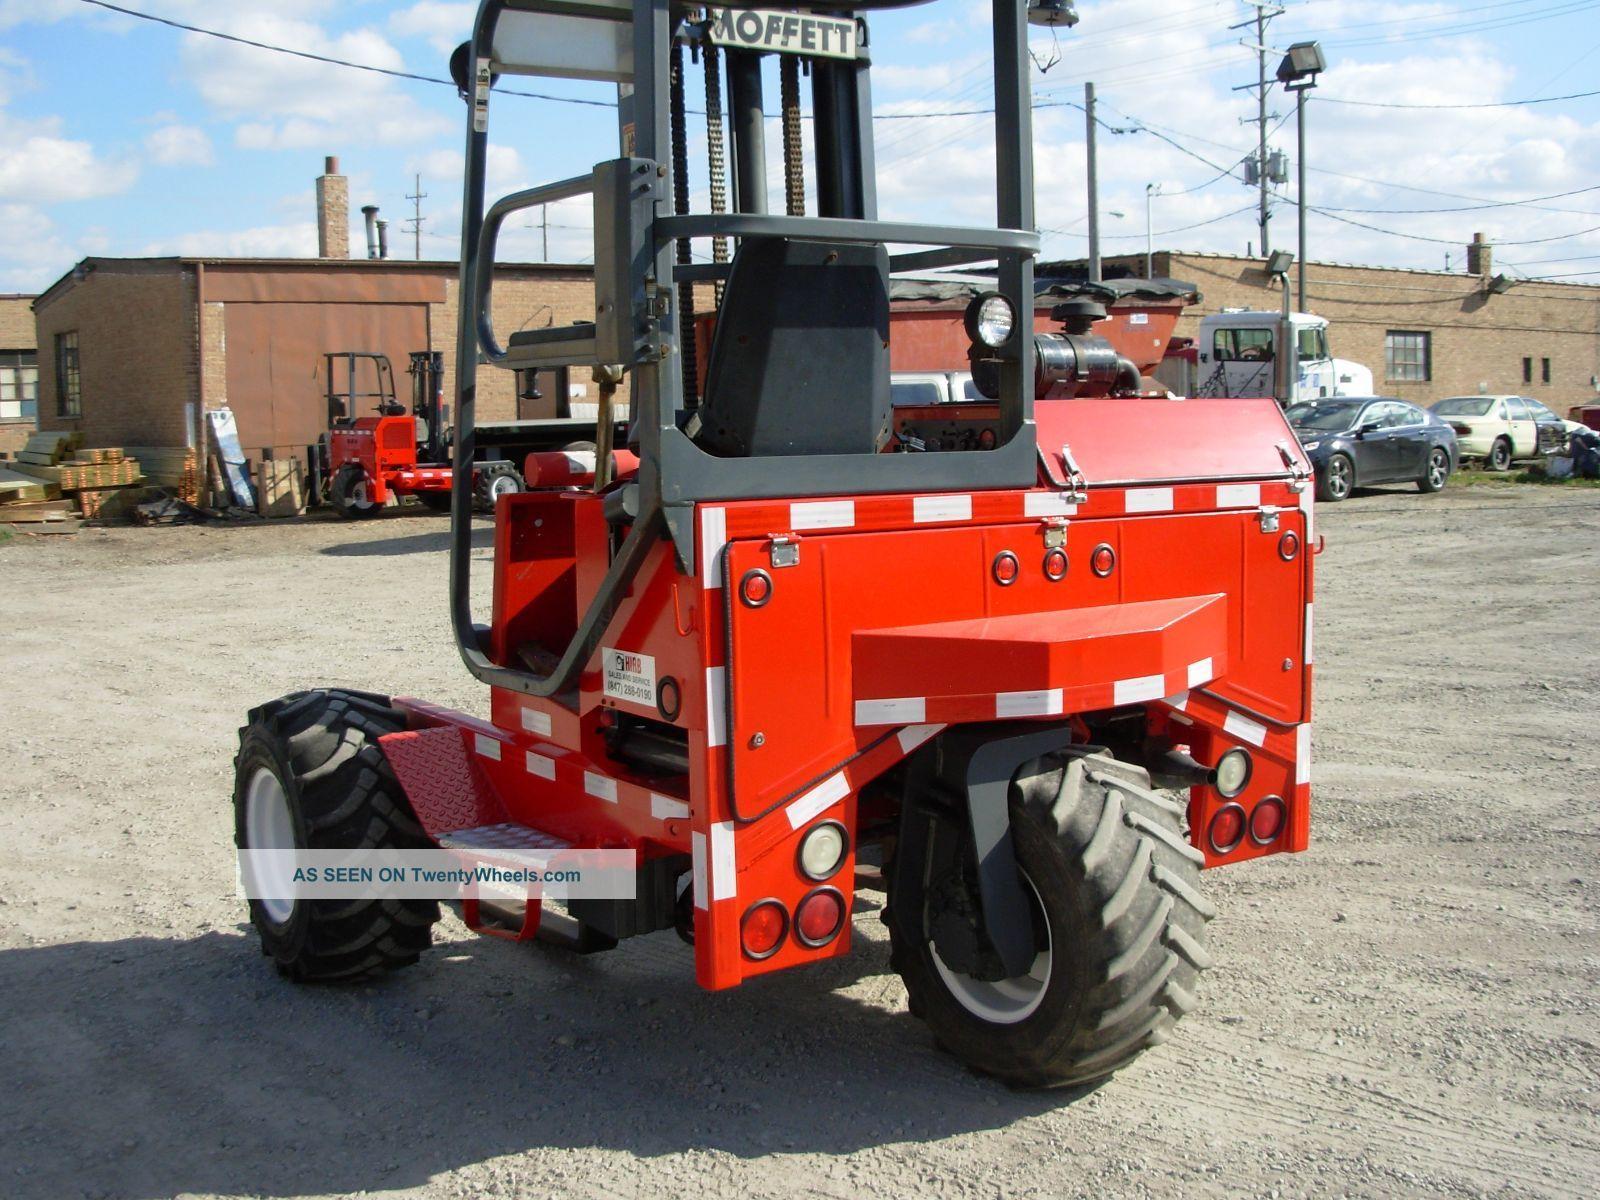 02 Moffett Forklift M5500